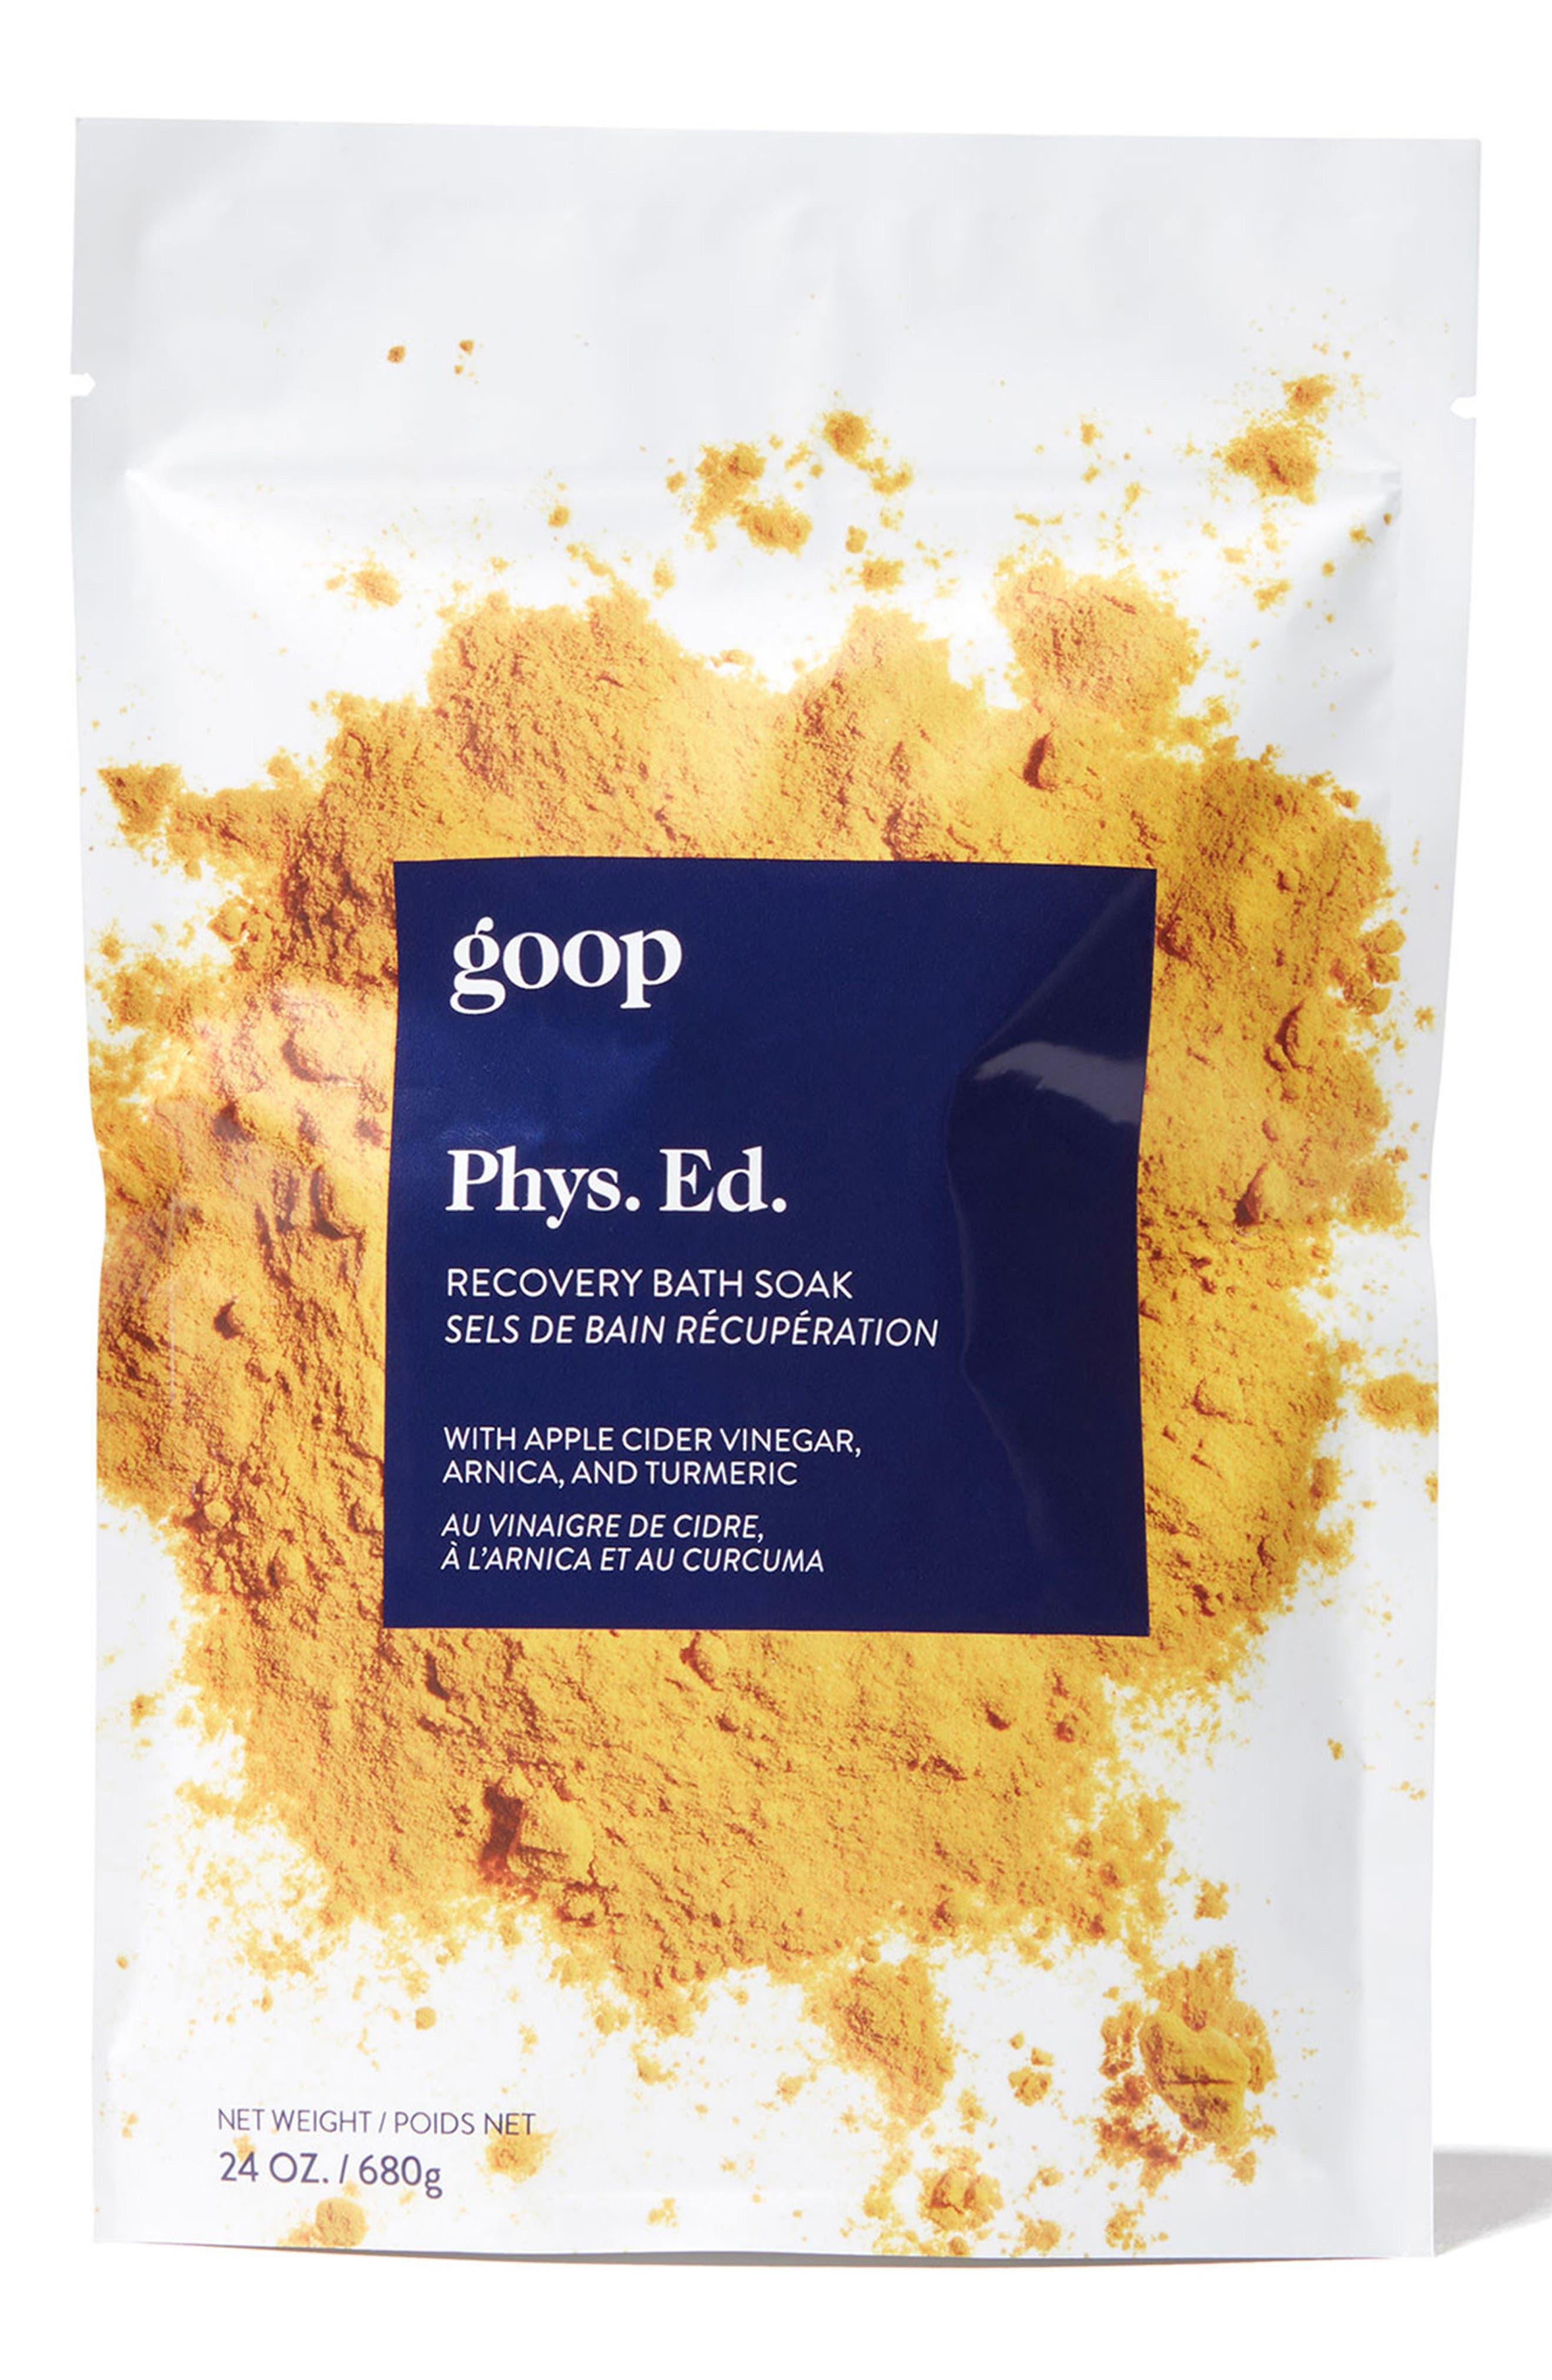 Phys.Ed. Recovery Bath Soak,                         Main,                         color, None